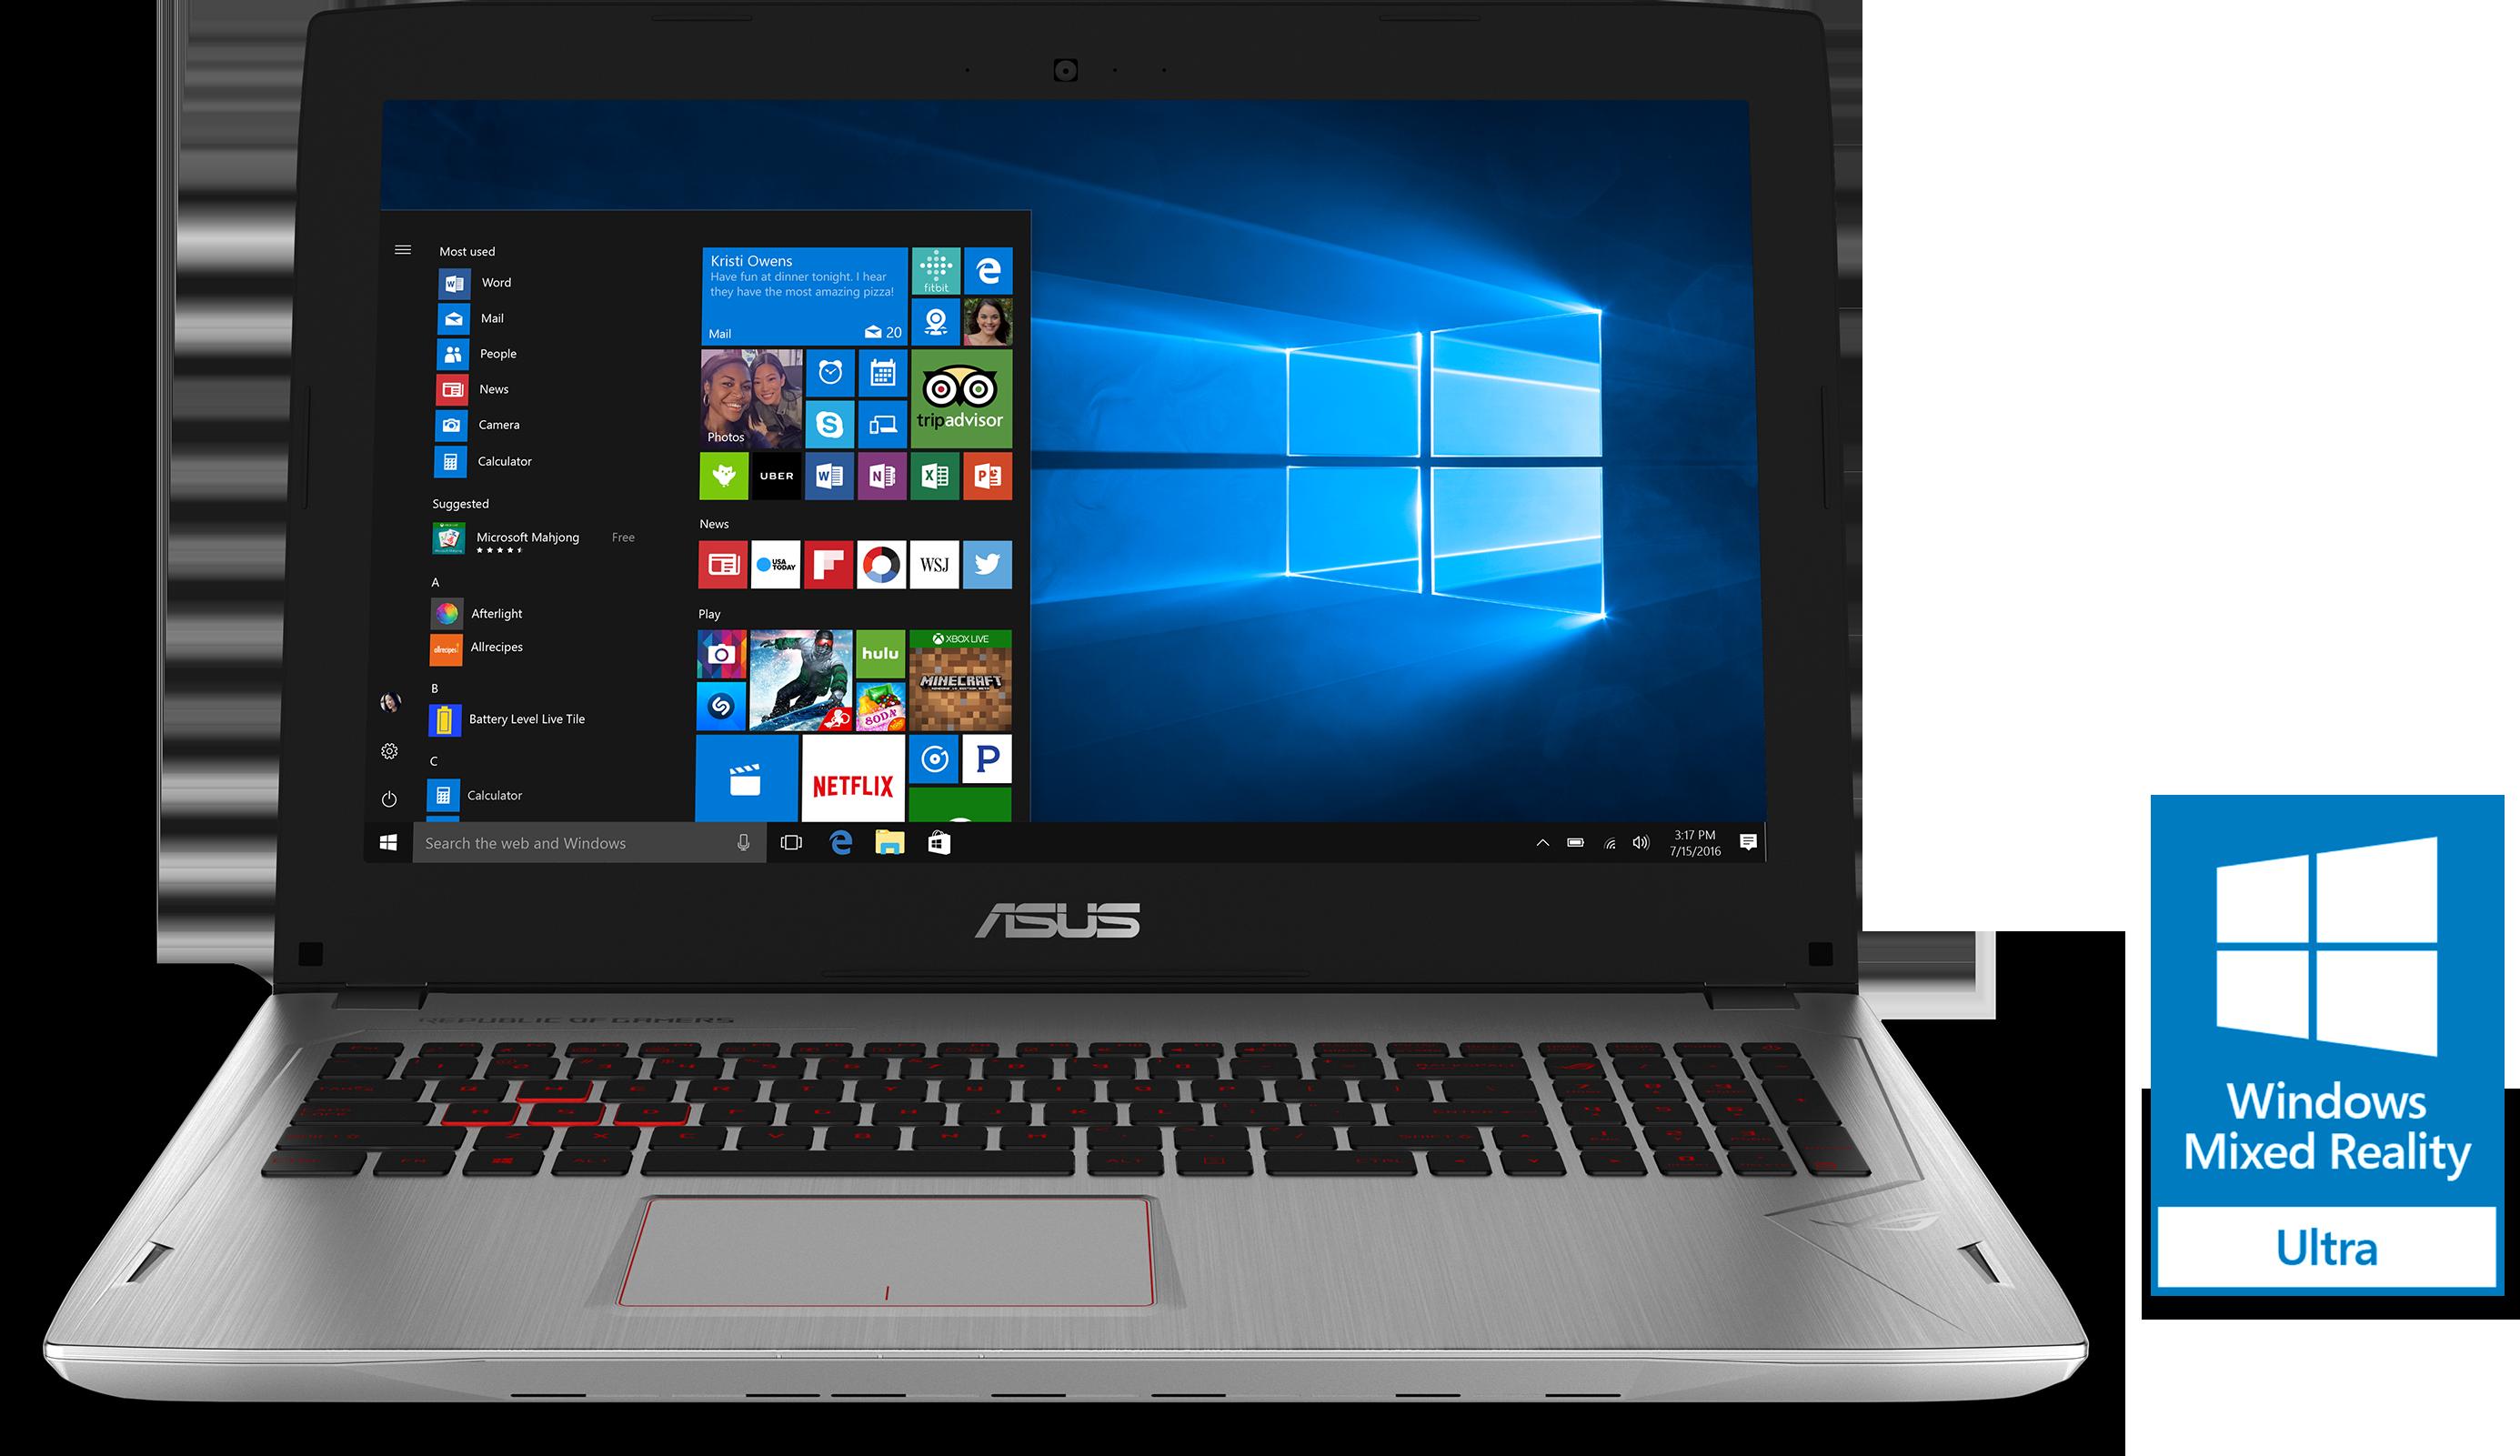 ASUS ROG Strix GL502VS-US71 Gaming Laptop